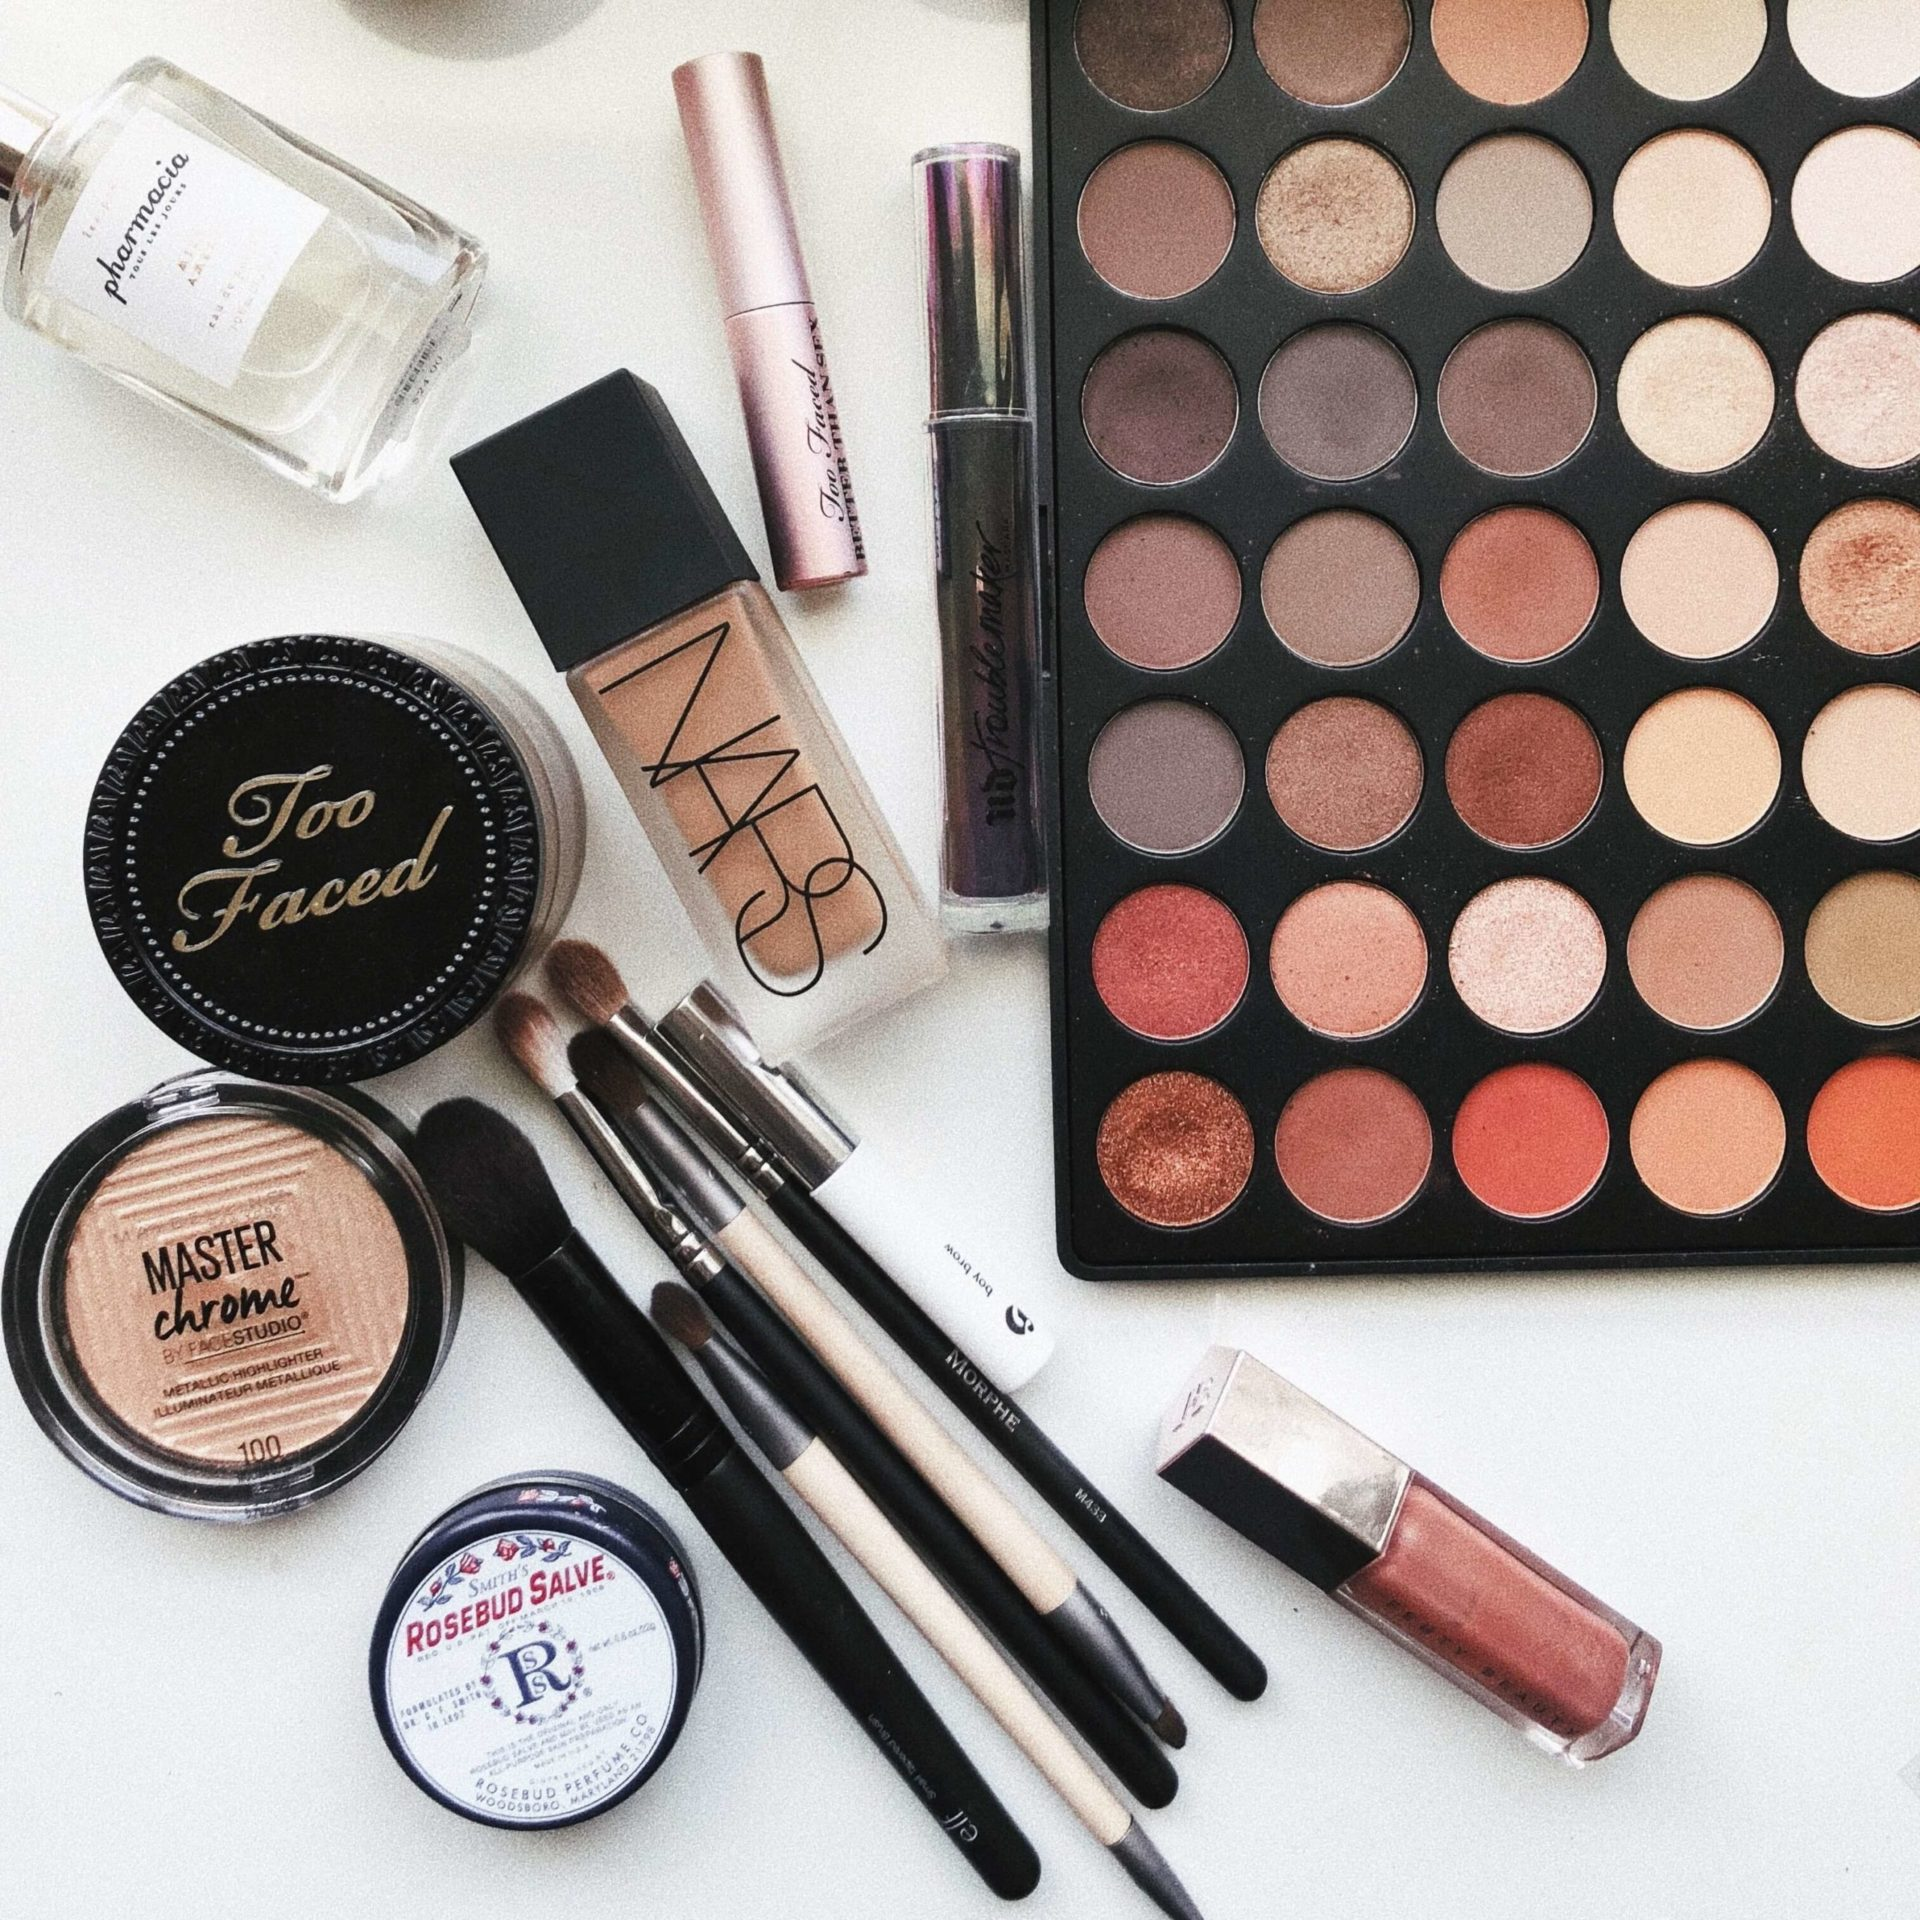 Makeup test for olive skin lifestylemajor edited scaled